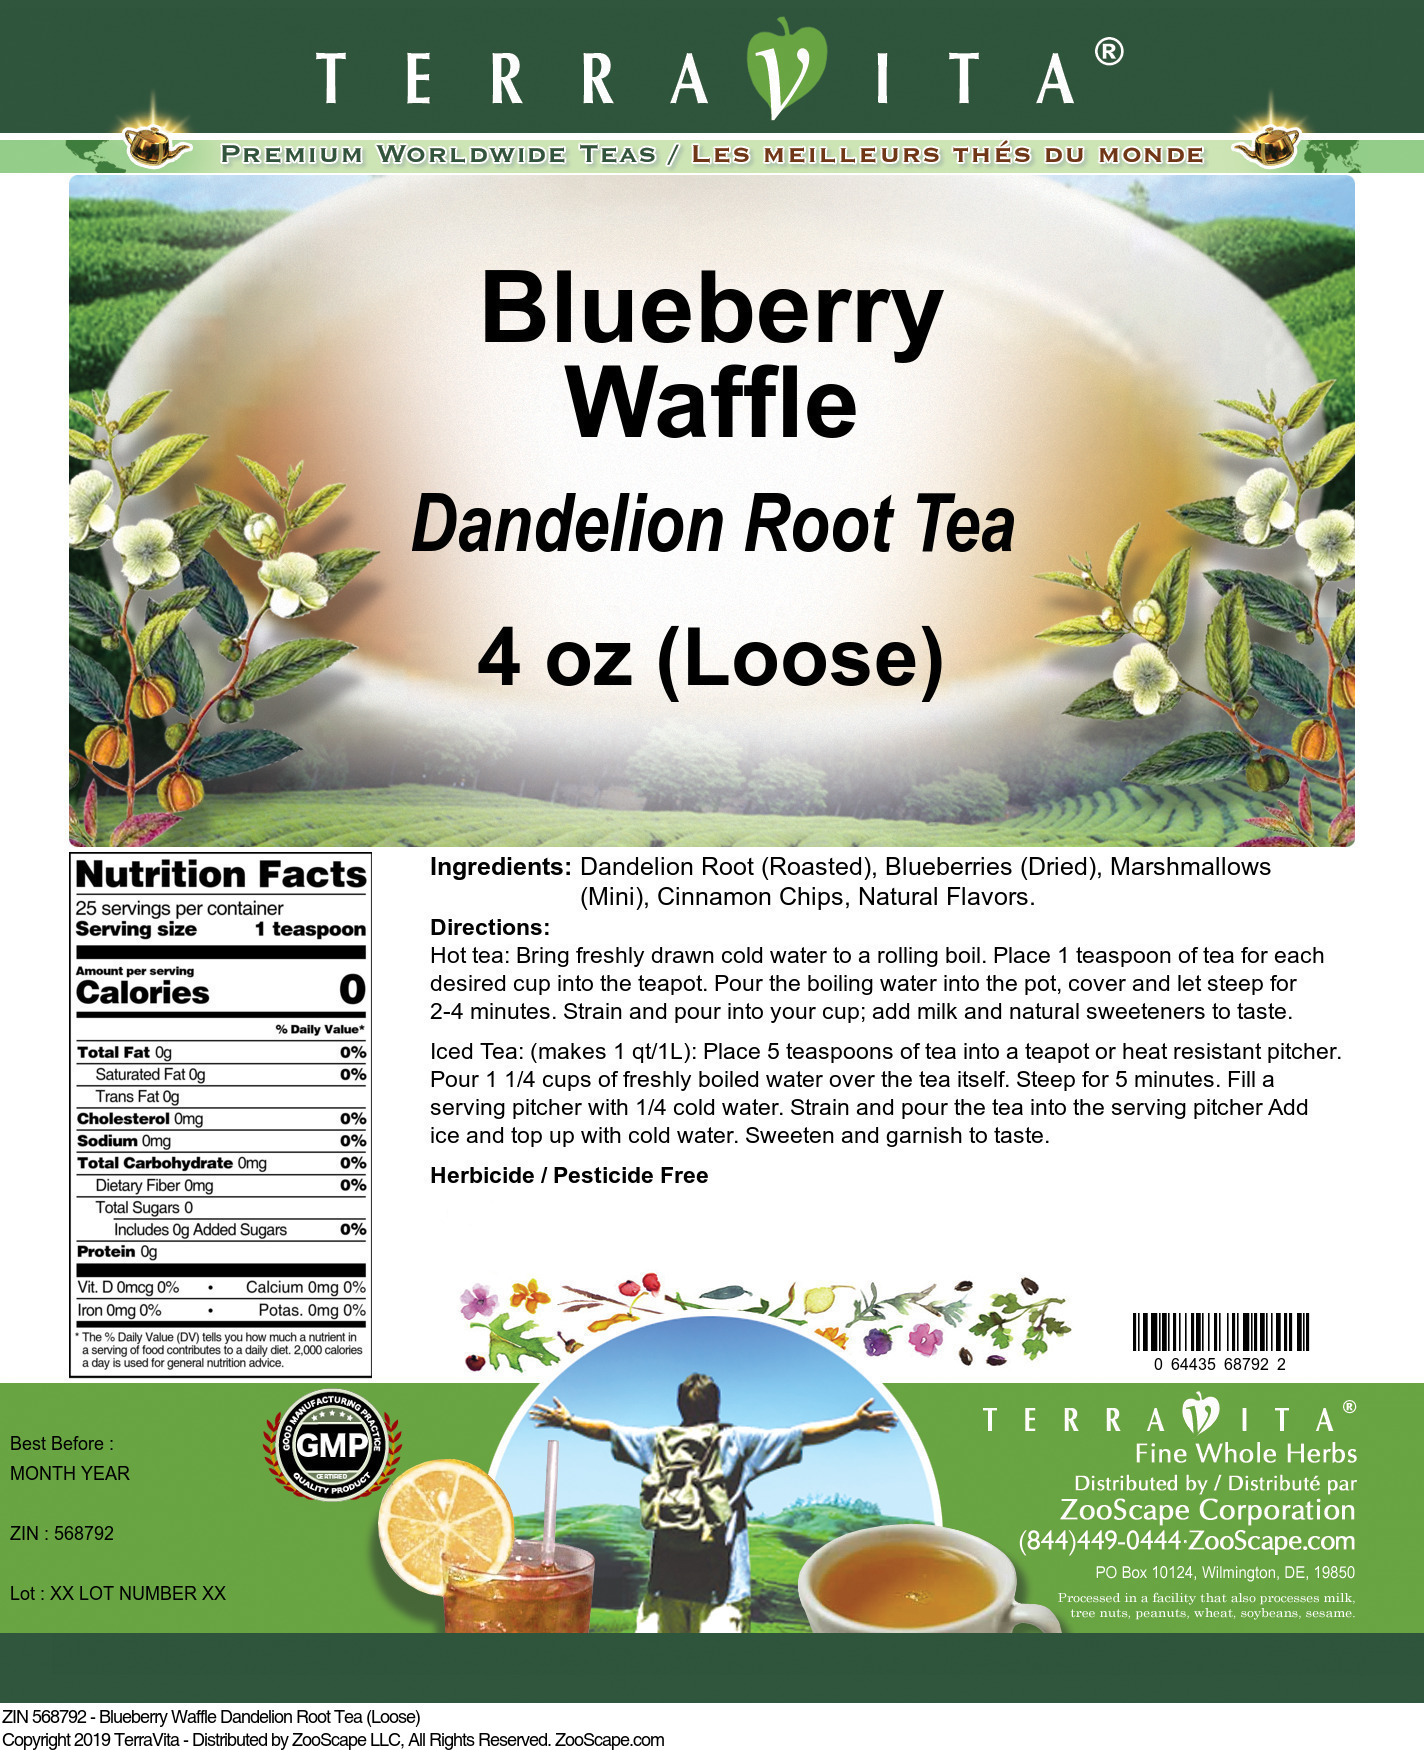 Blueberry Waffle Dandelion Root Tea (Loose)